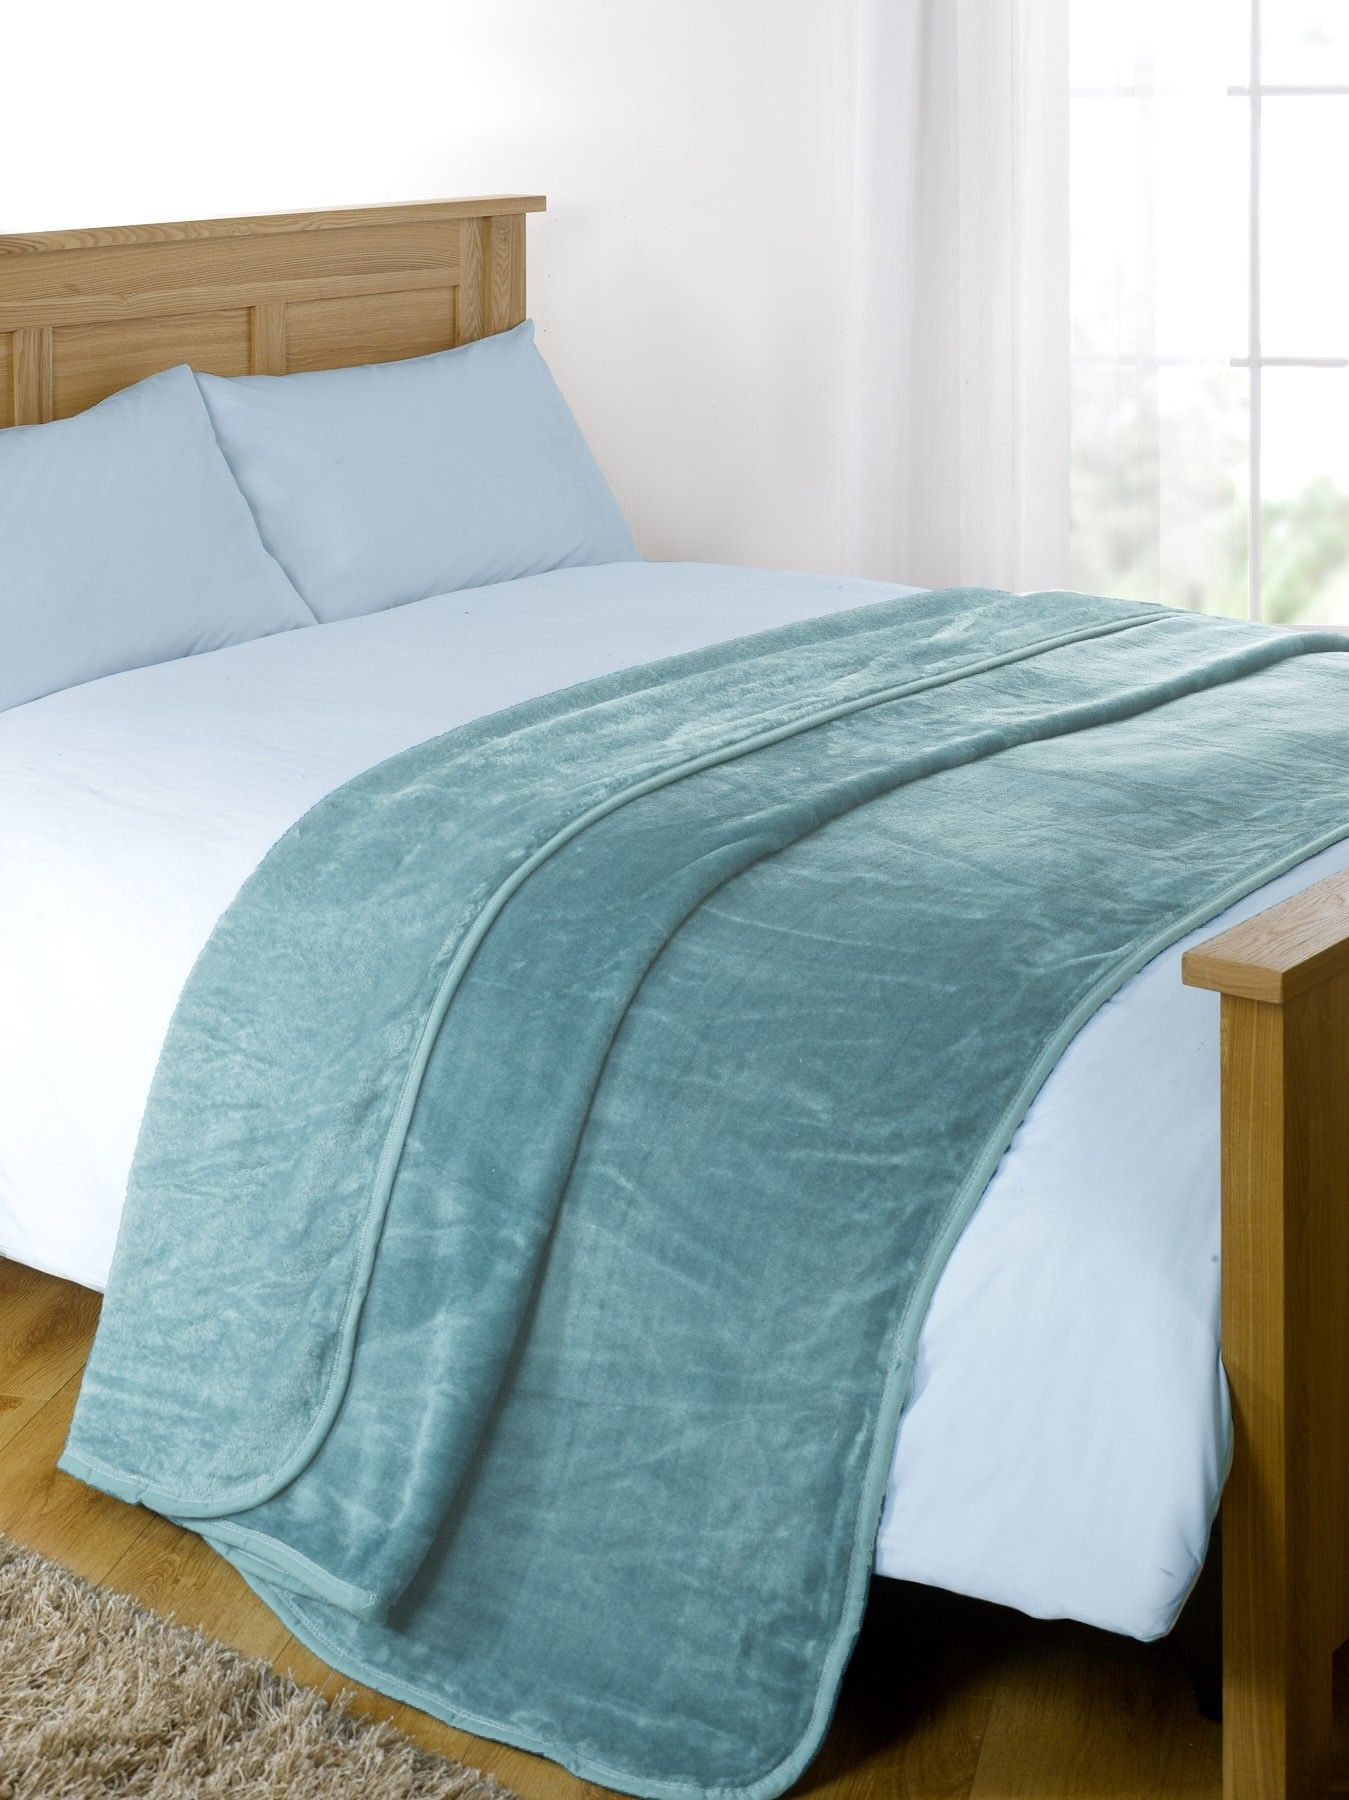 Faux Fur Mink Throw Teal Sofa bed king size, Sofa